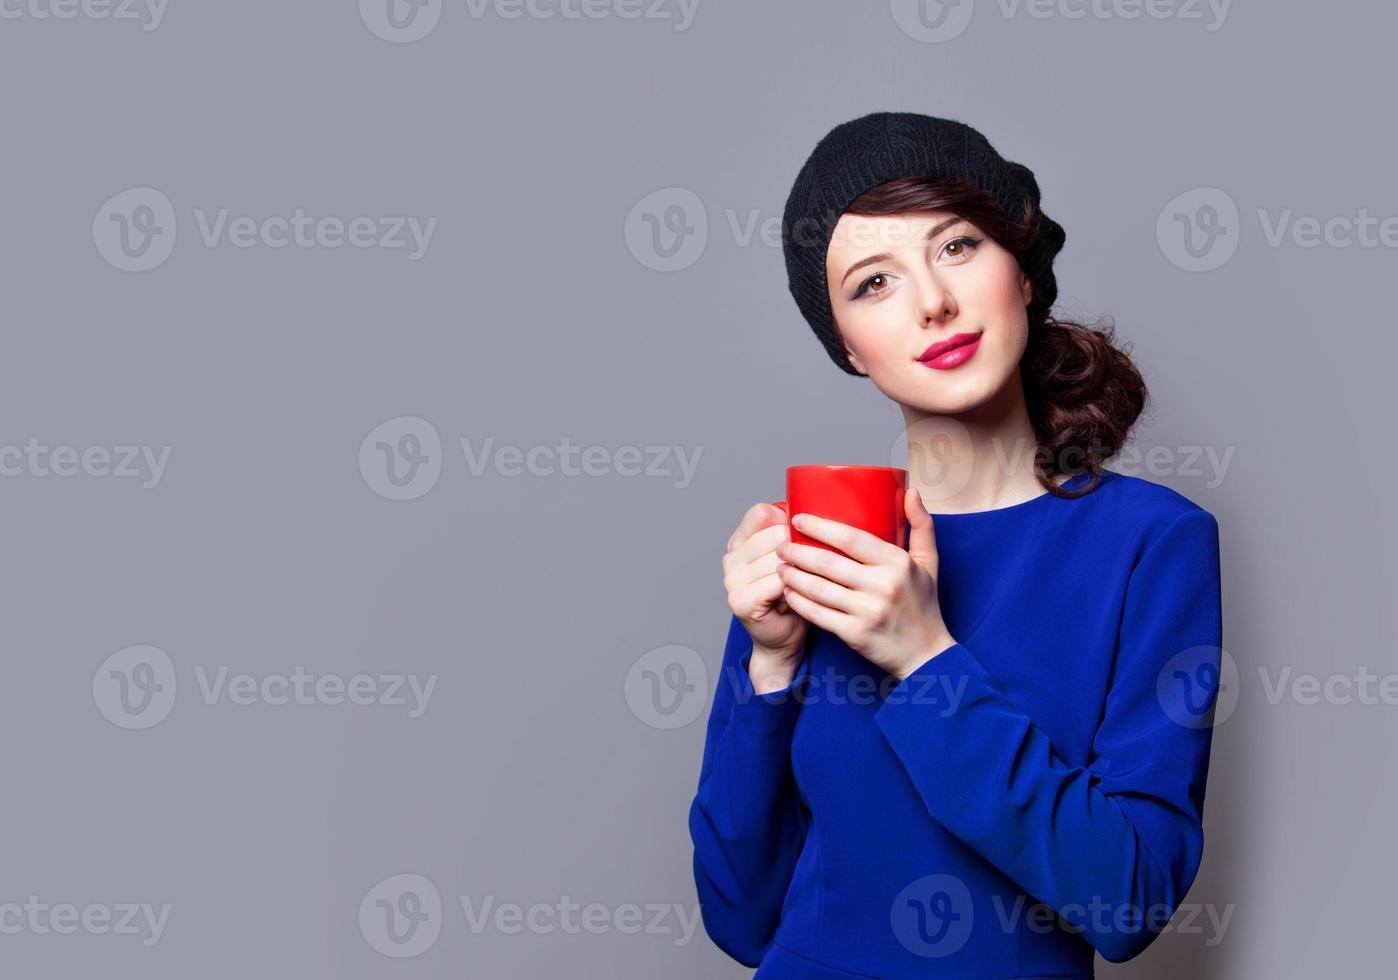 vrouwen in blauwe jurk met rode kop foto